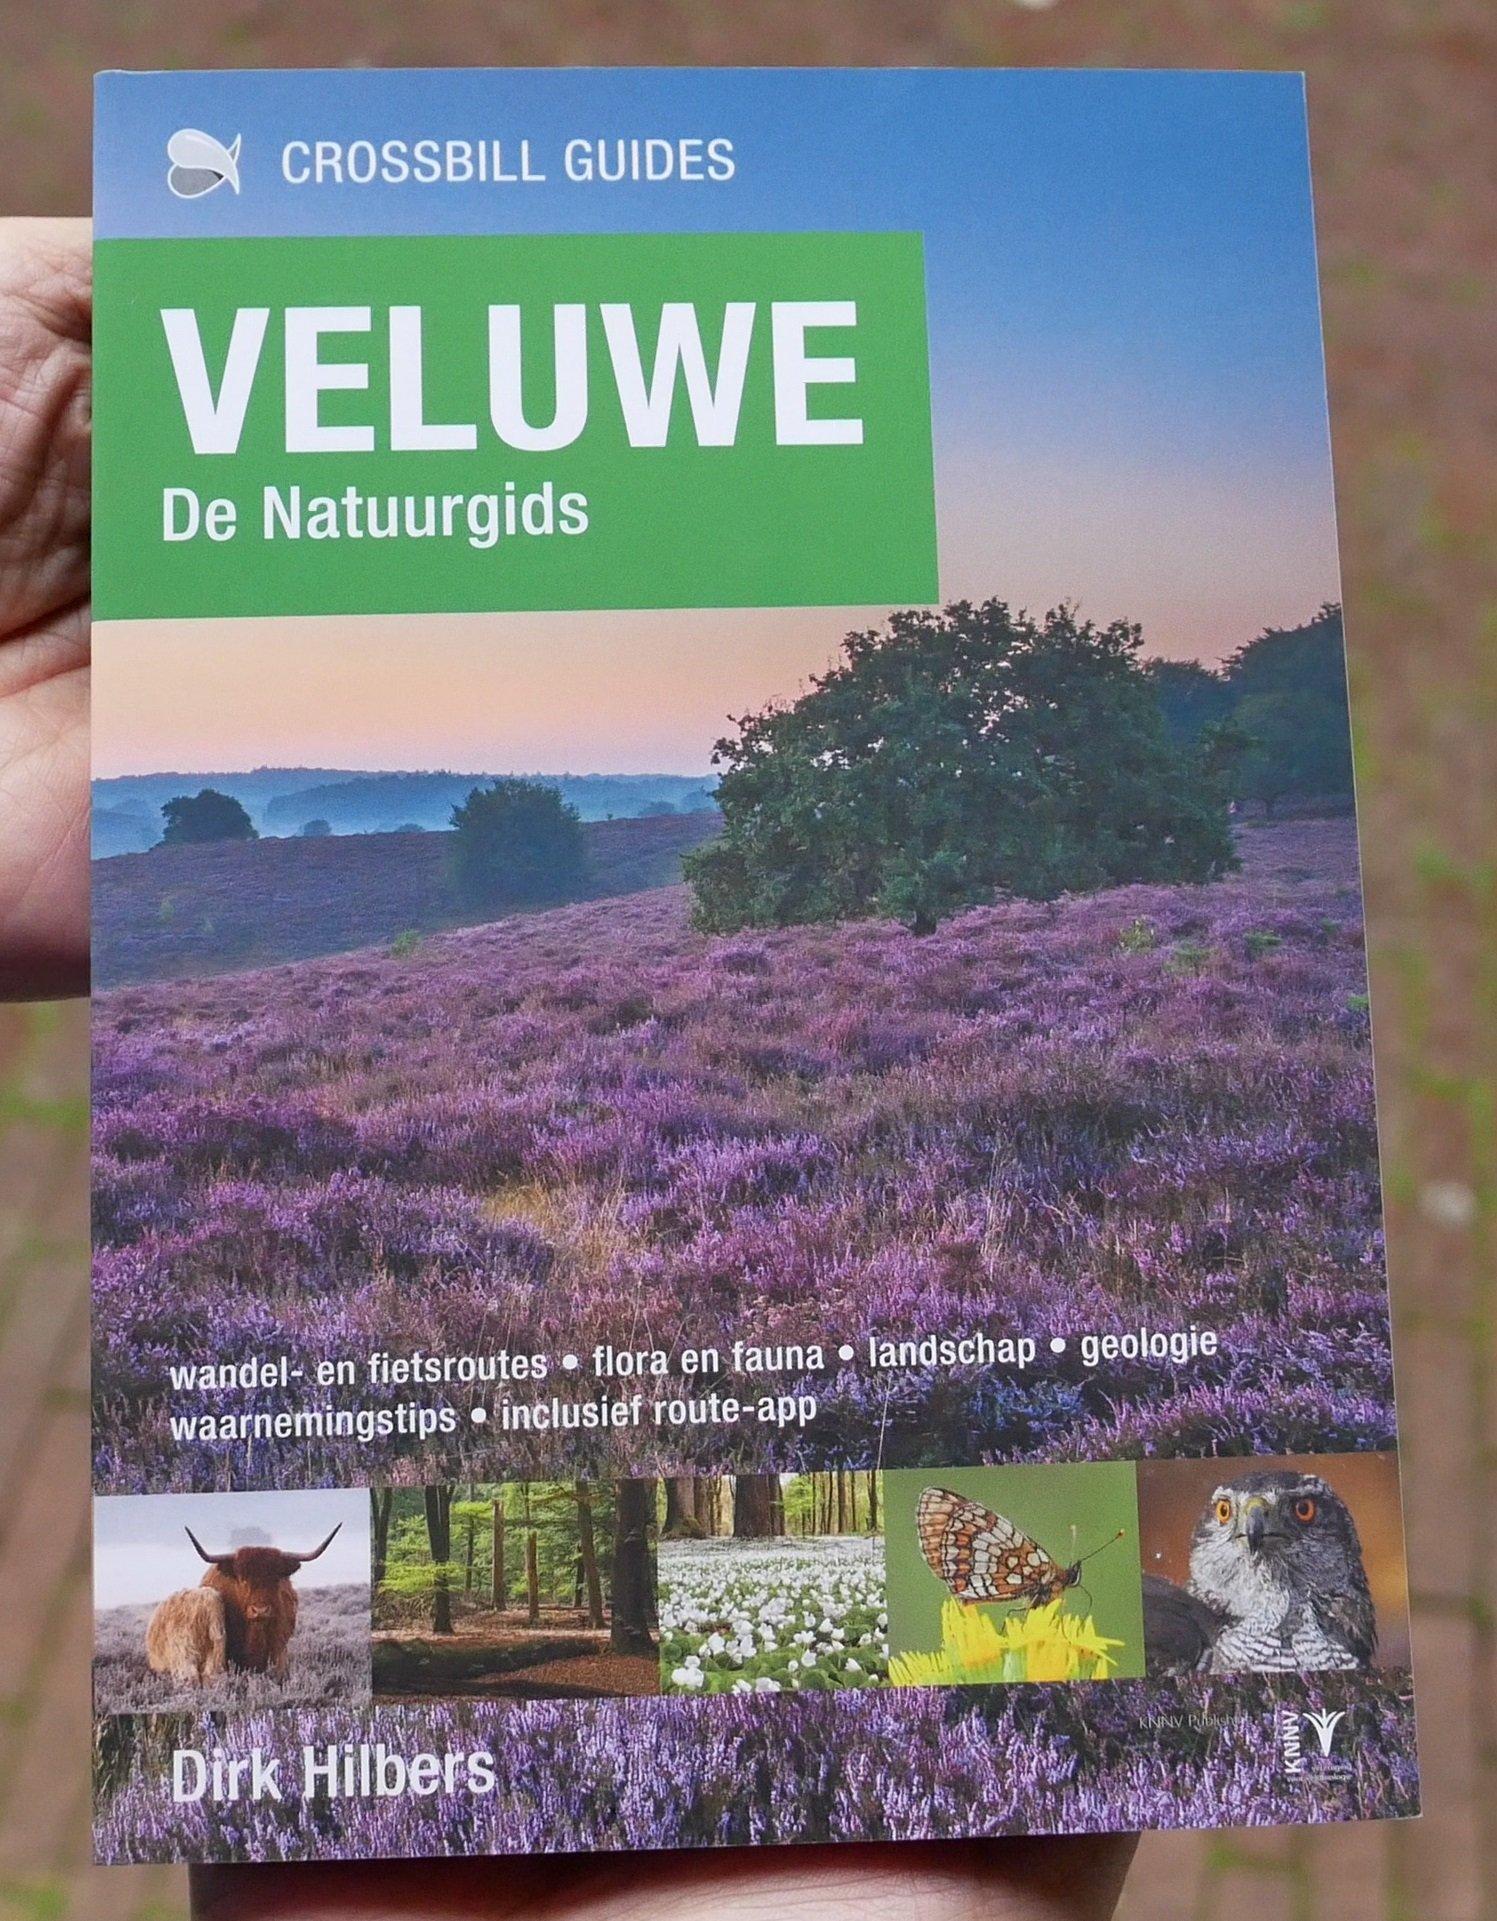 Veluwe - De Natuurgids | Dirk Hilbers 9789491648113 Dirk Hilbers Crossbill Guides Foundation / KNNV   Cadeau-artikelen, Natuurgidsen, Wandelgidsen Arnhem en de Veluwe